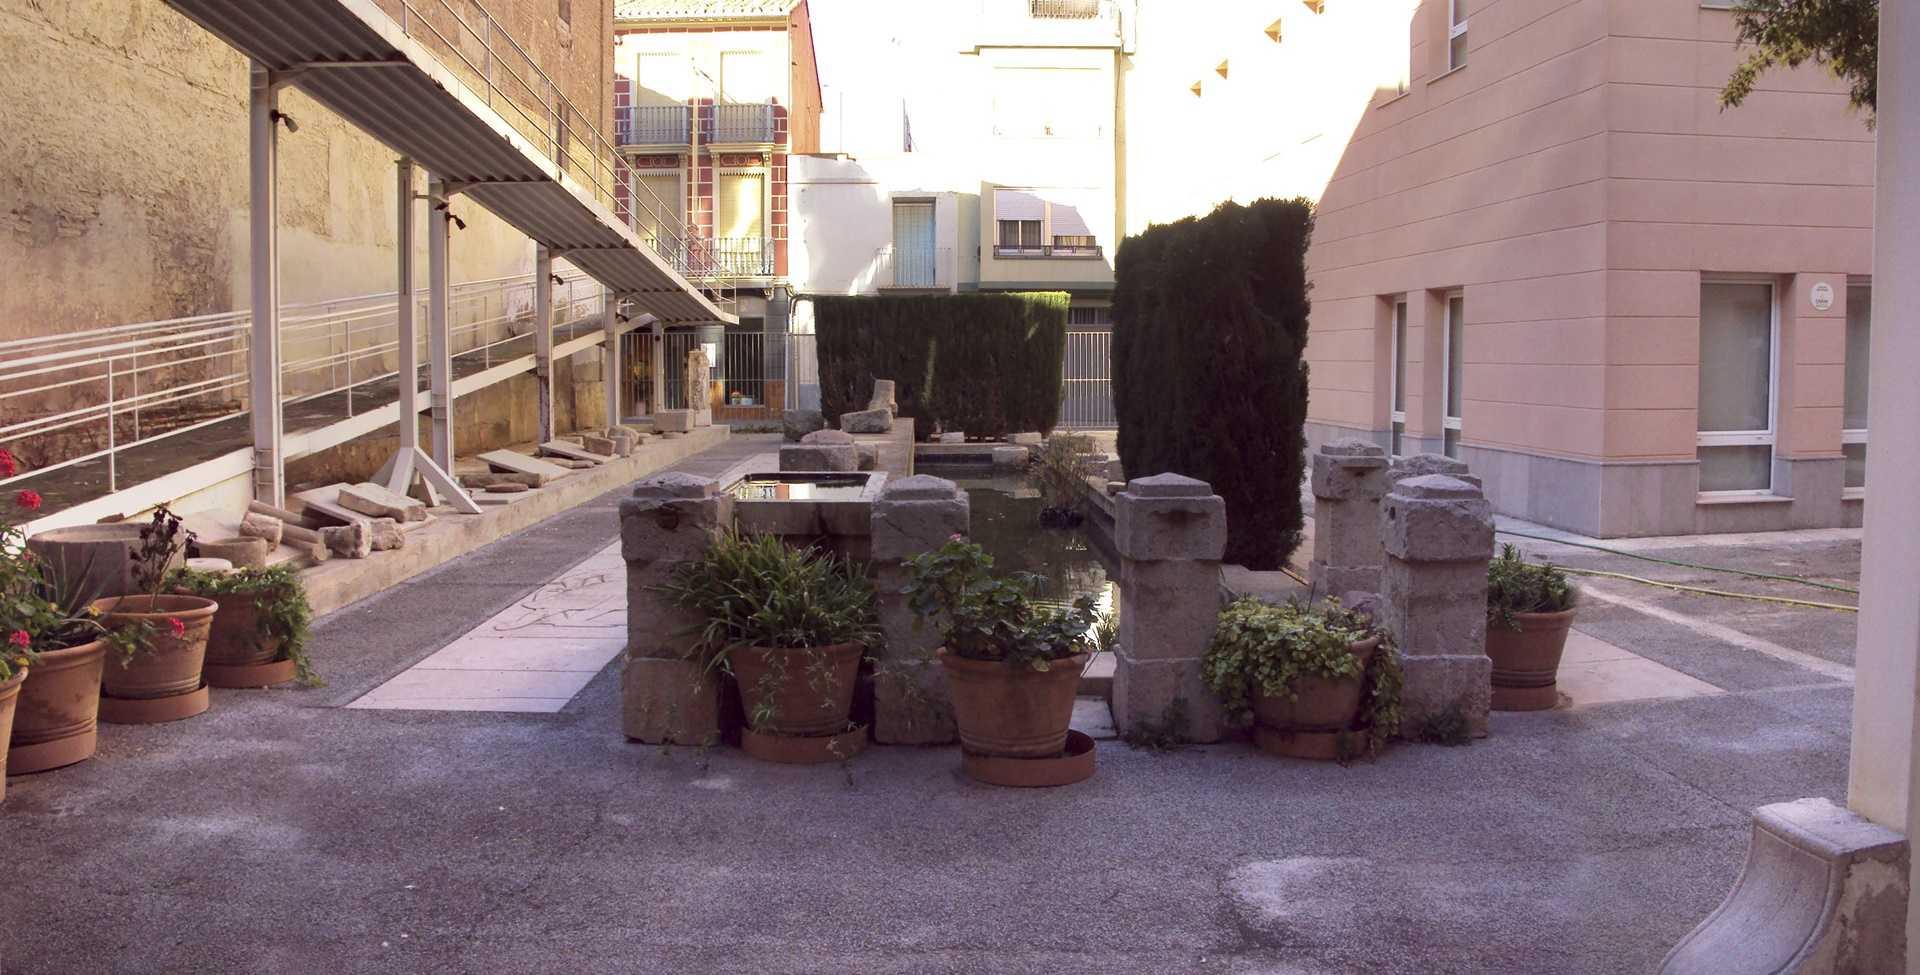 Museu Arqueològic Comarcal de la Plana Baixa